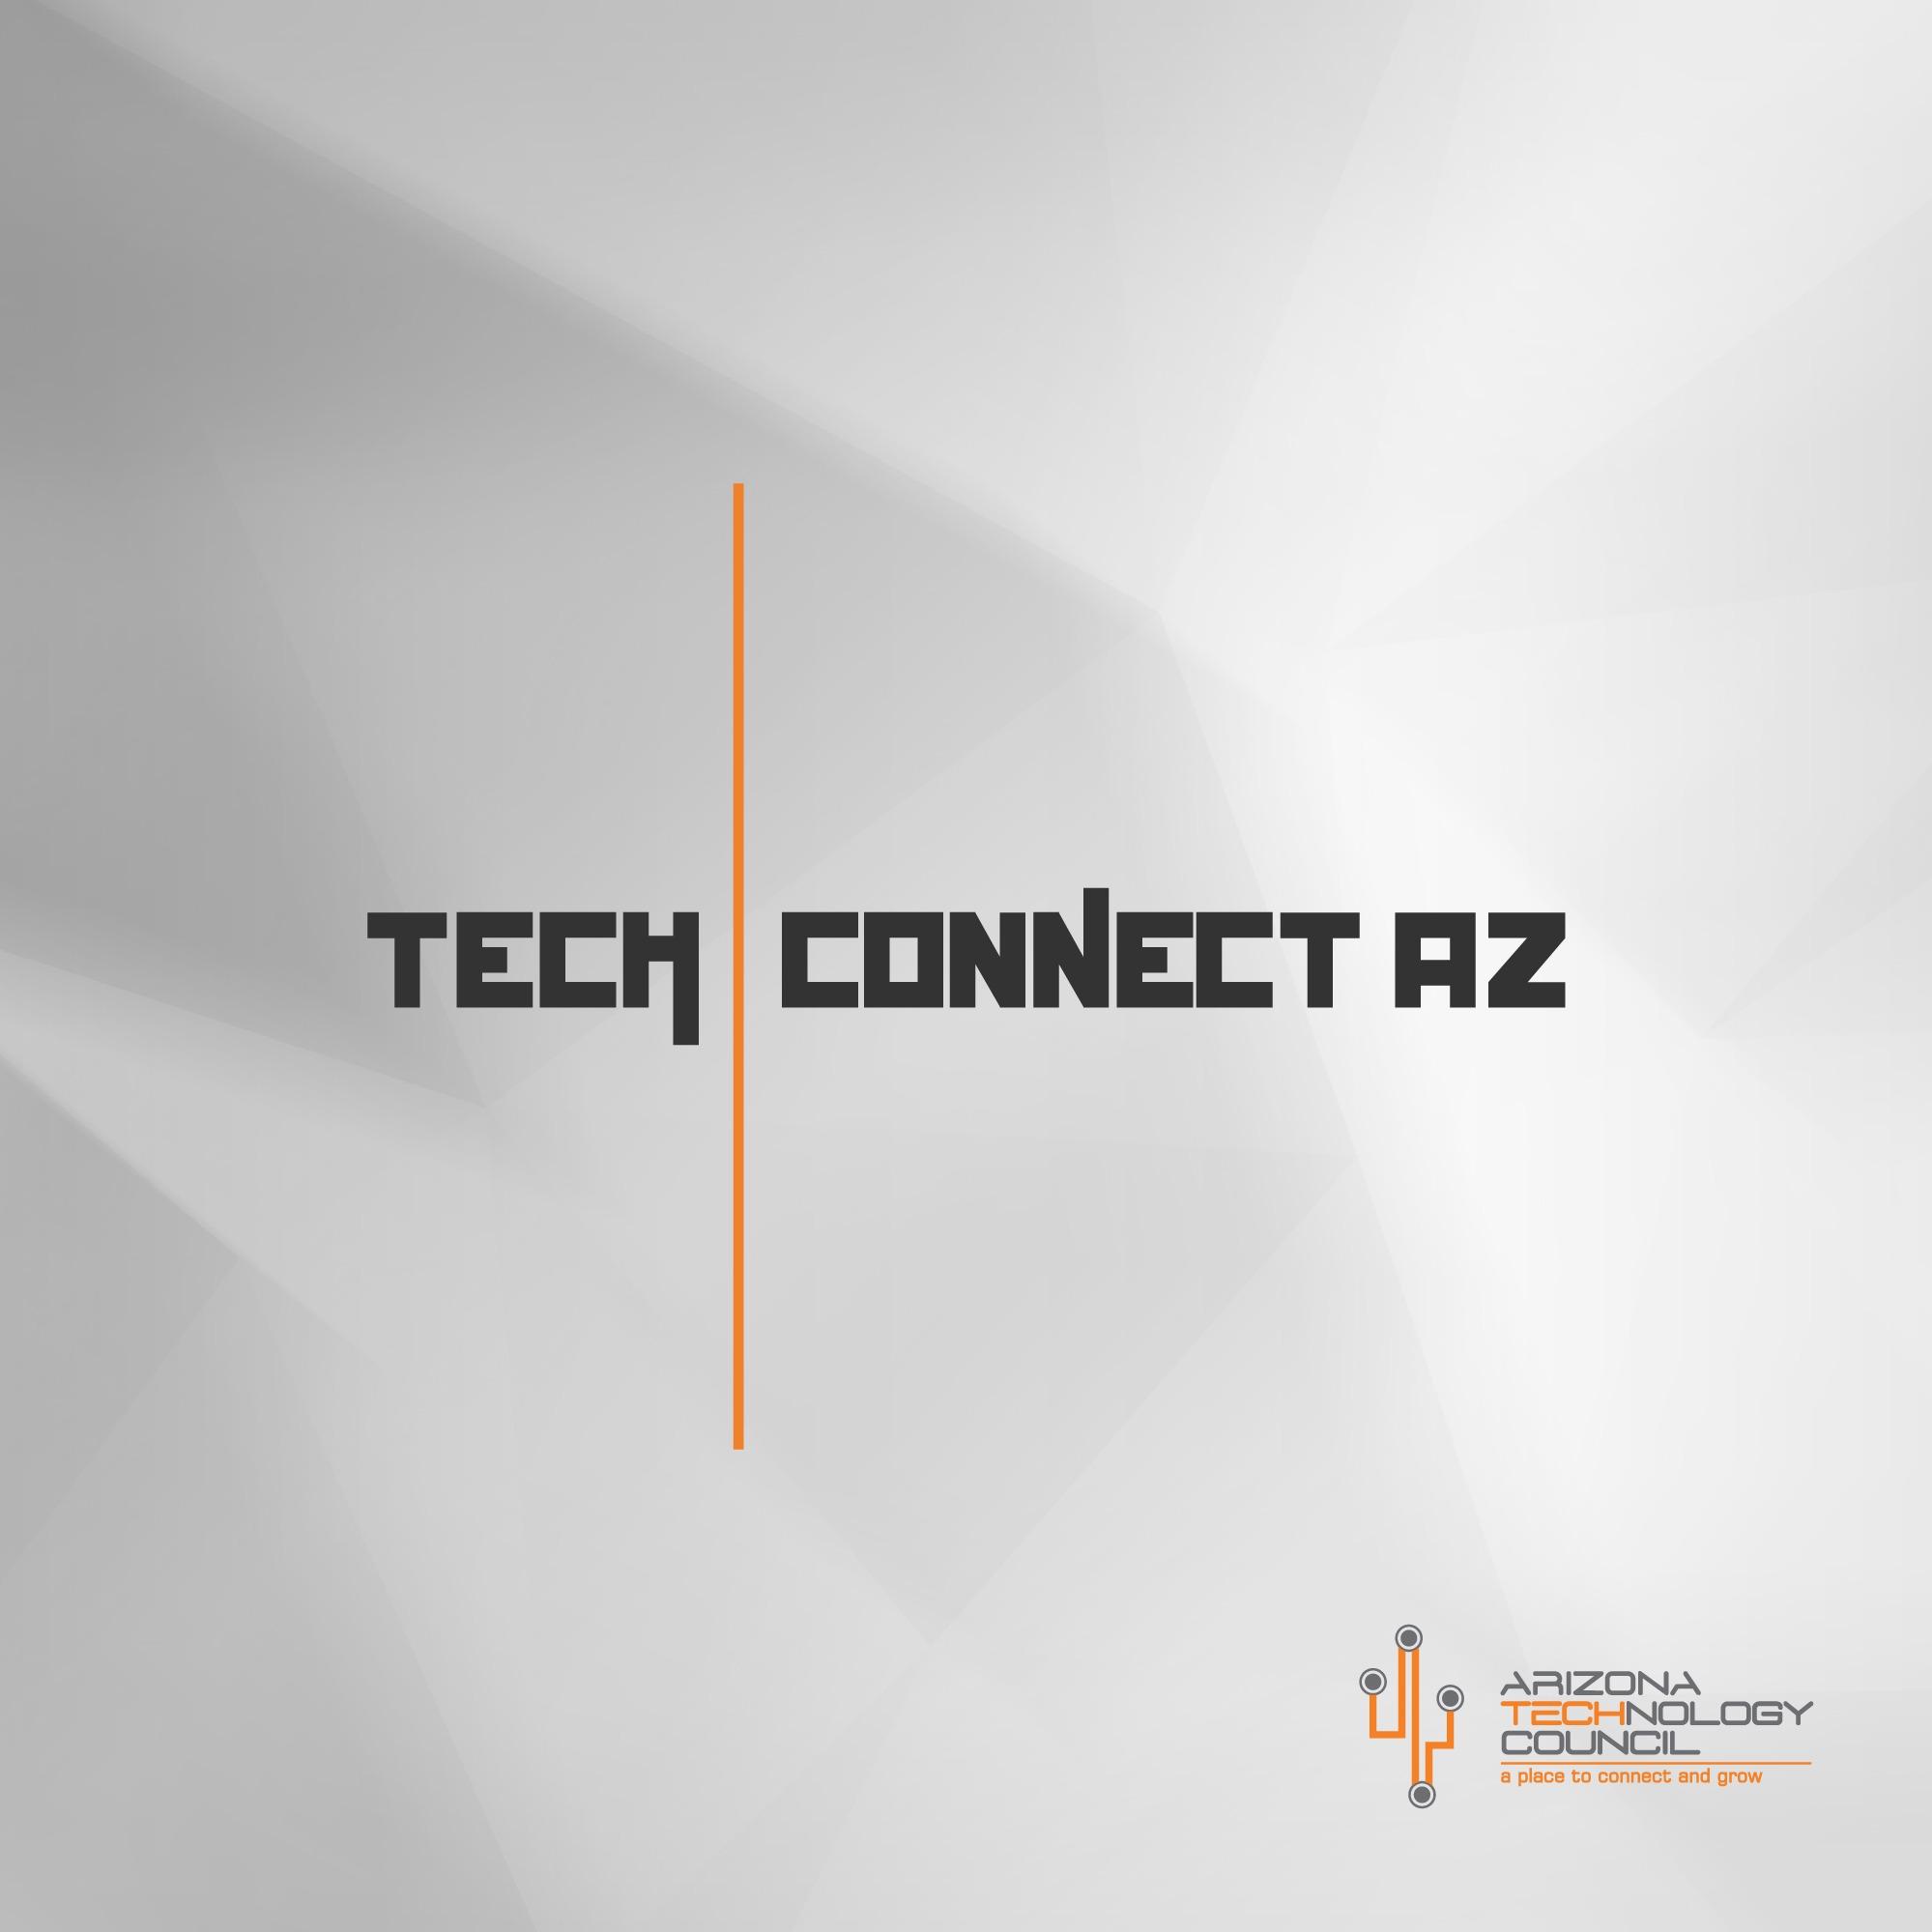 Tech Connect AZ Ep. 1 - Jane Poynter, CEO of World View Enterprises